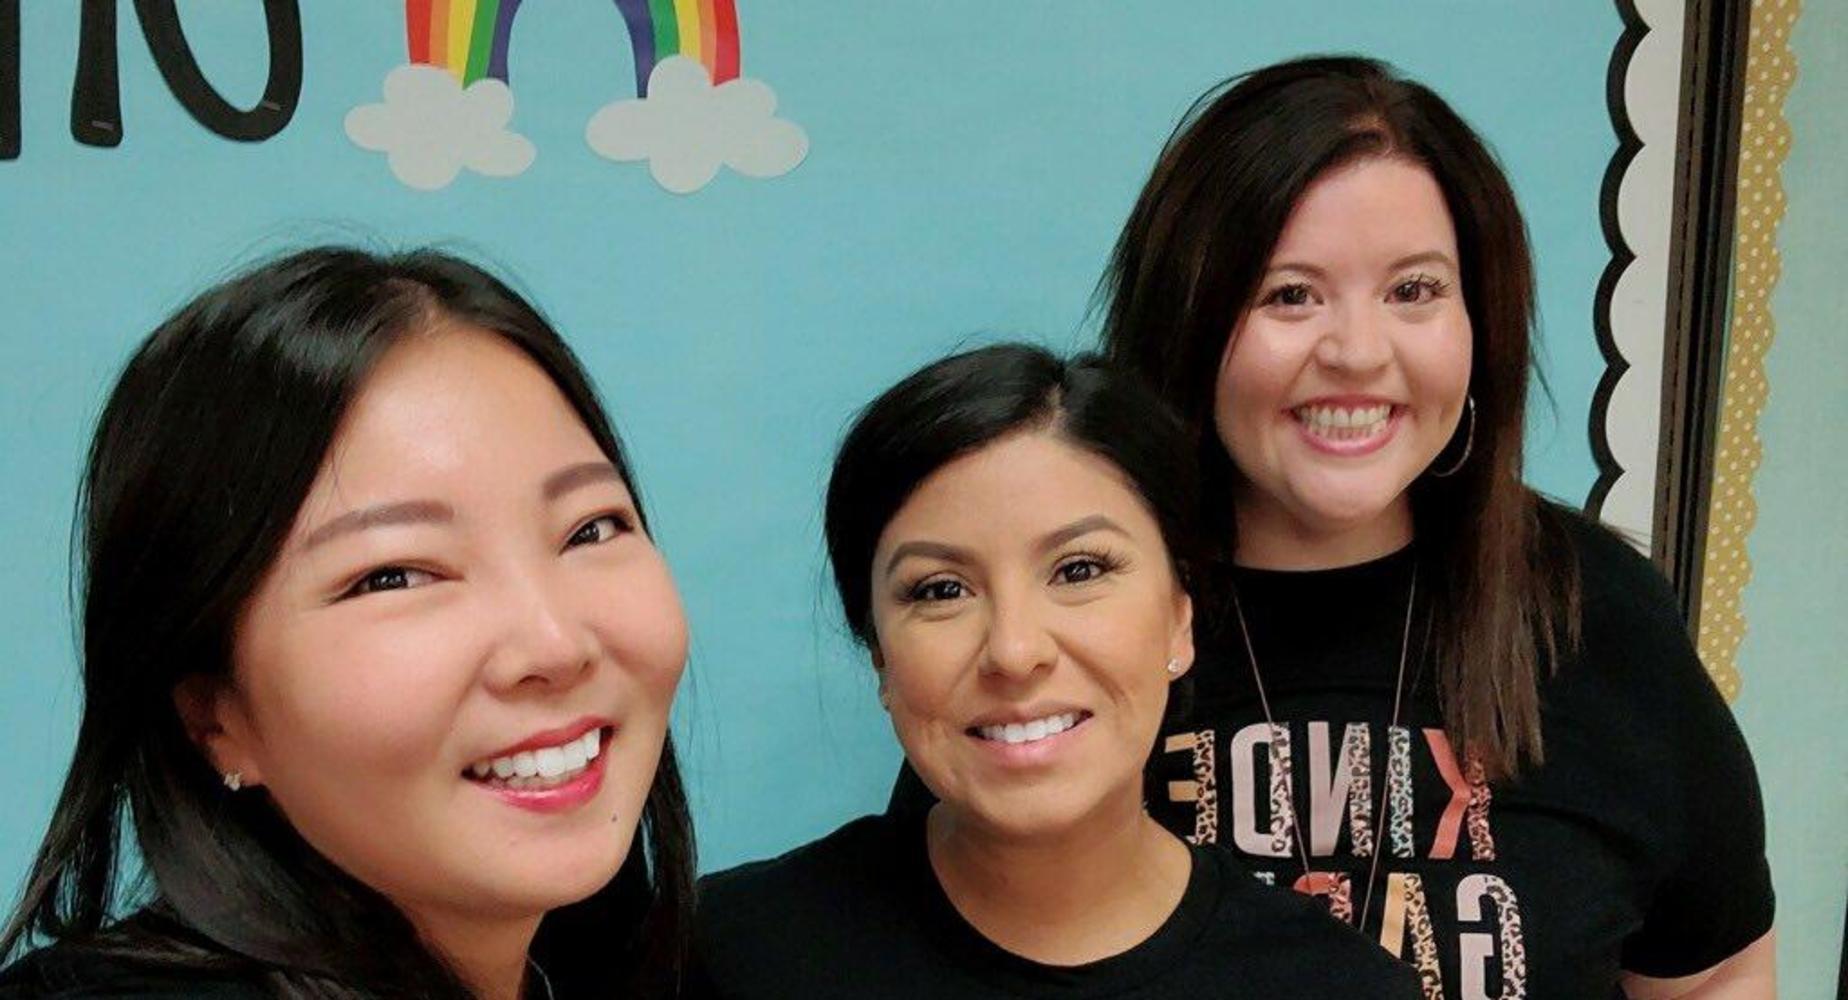 Sandrini teachers smiling for the first week of school!